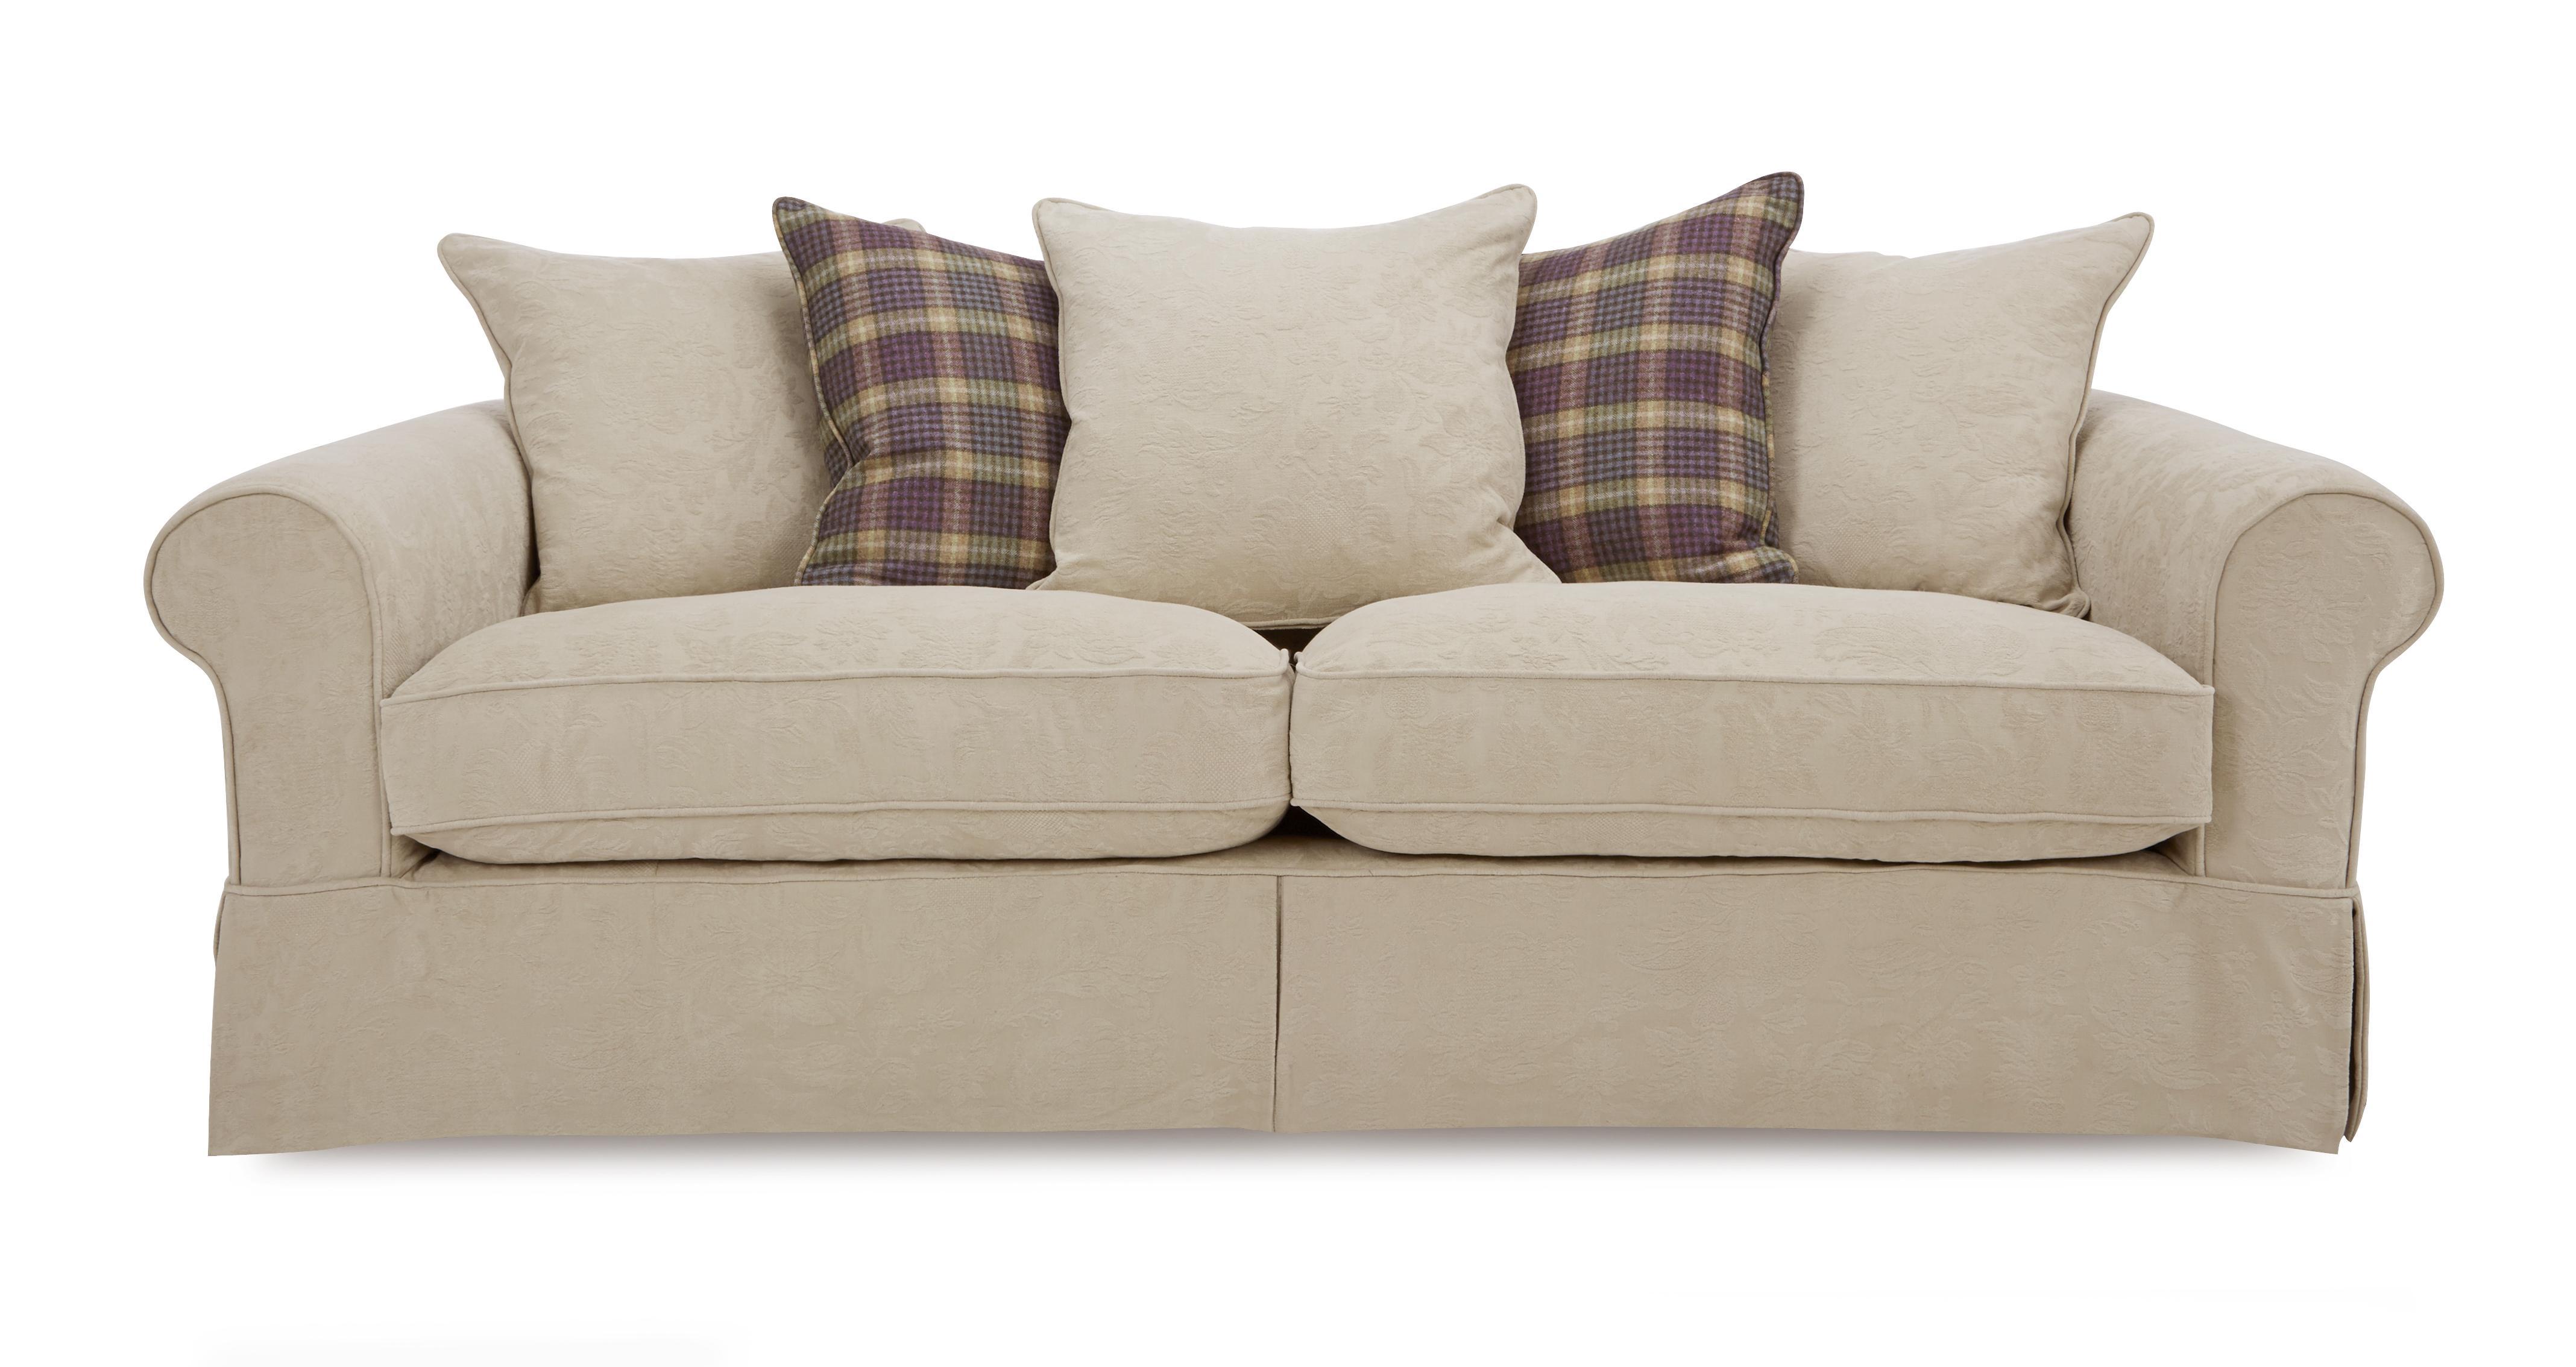 pattern for loose sofa cover safari set dfs covers brokeasshome